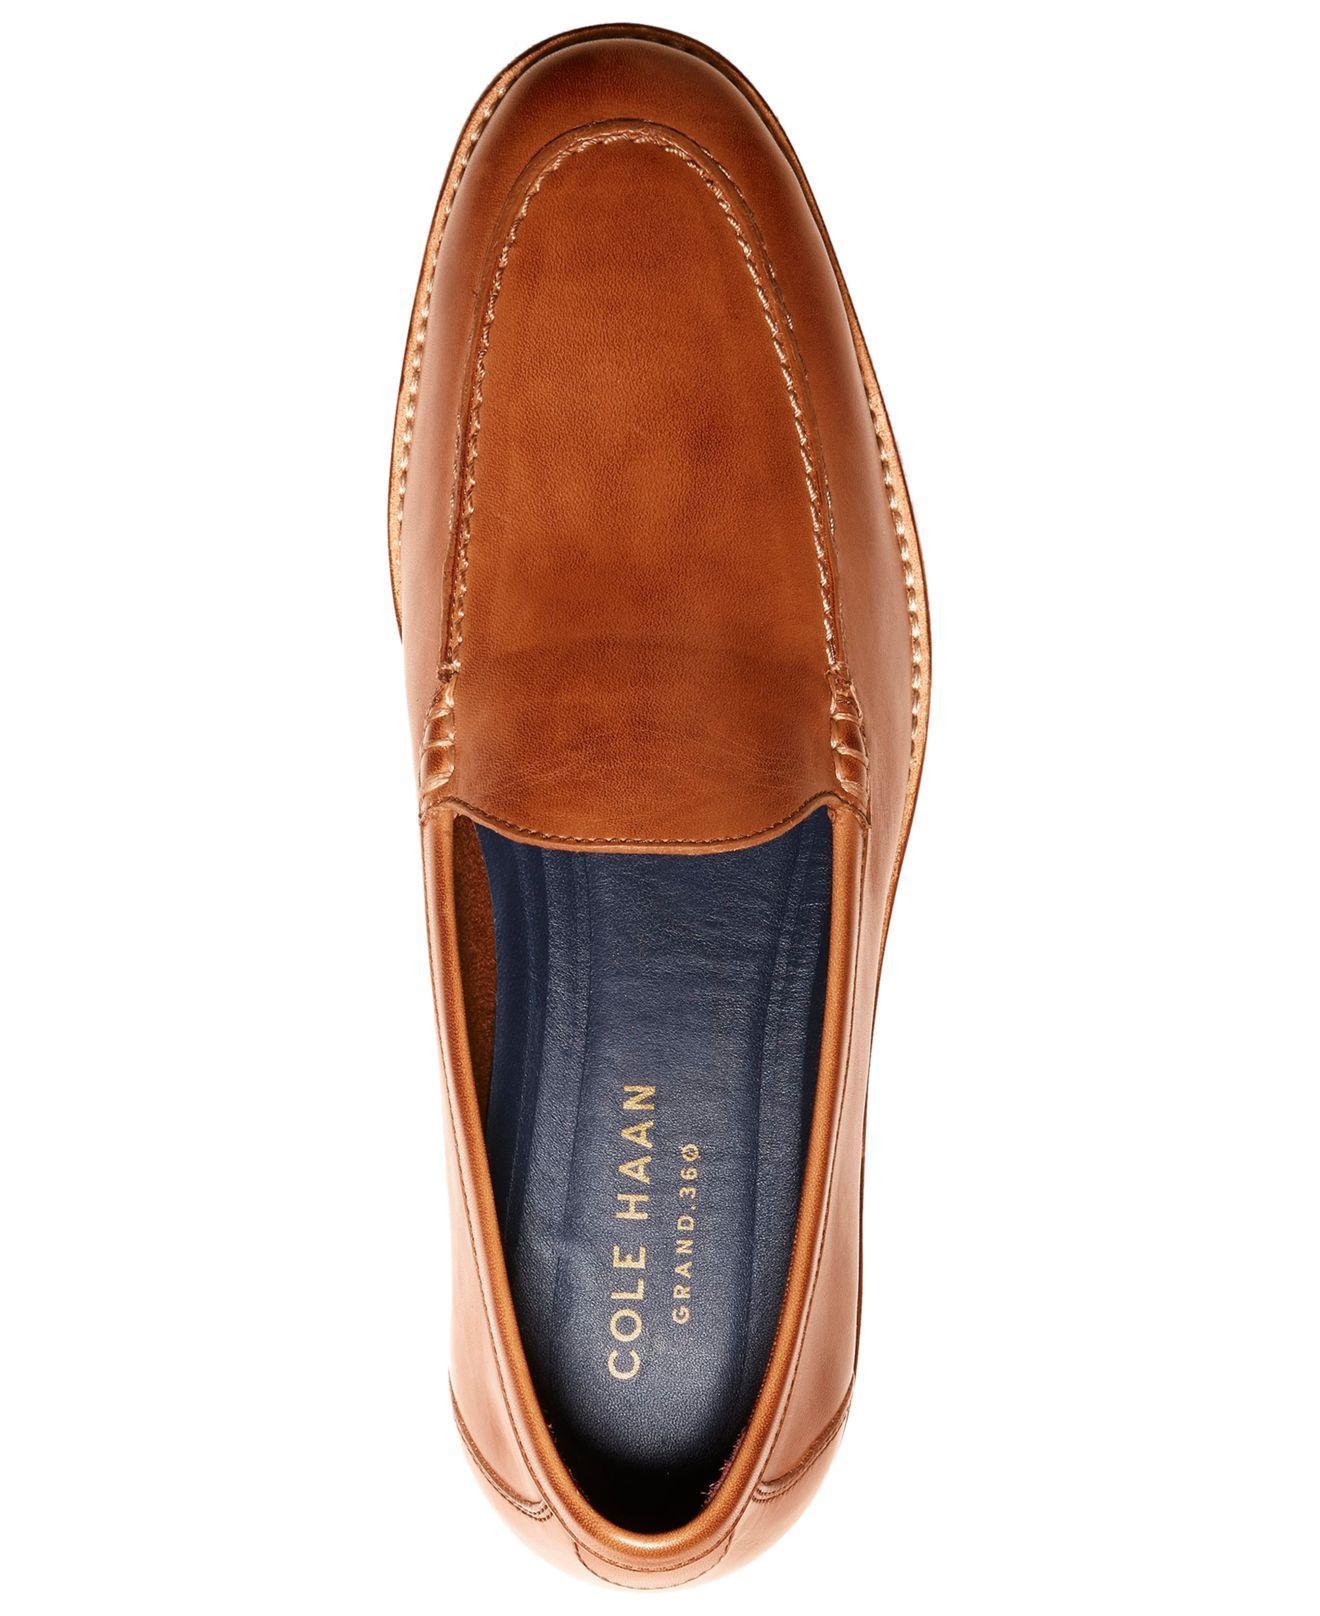 9395d834fb5 ... Feathercraft Grand Venetian Loafers for Men - Lyst. View fullscreen